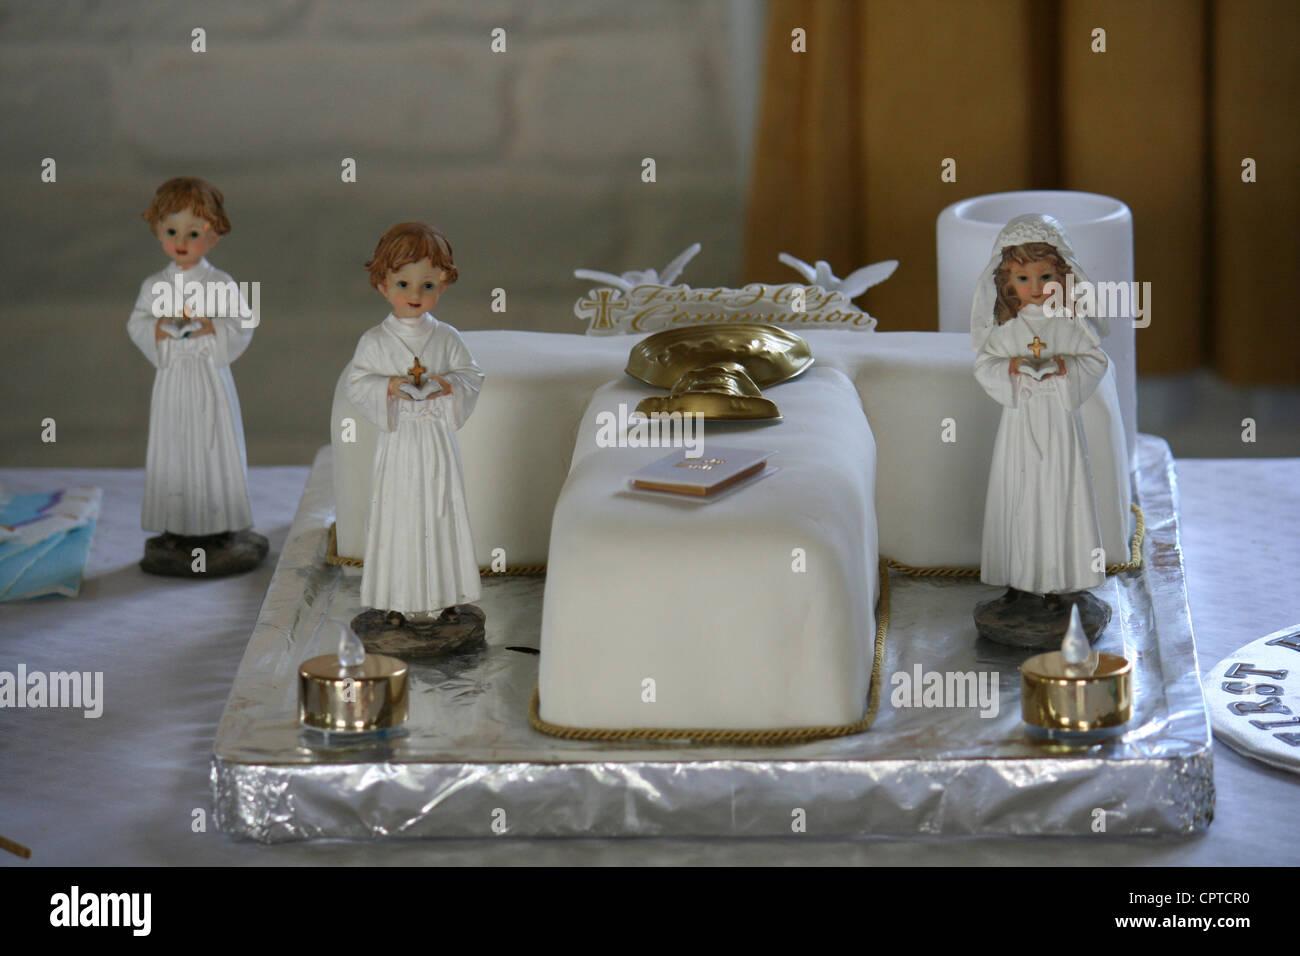 Communion Cake Stock Photos & Communion Cake Stock Images